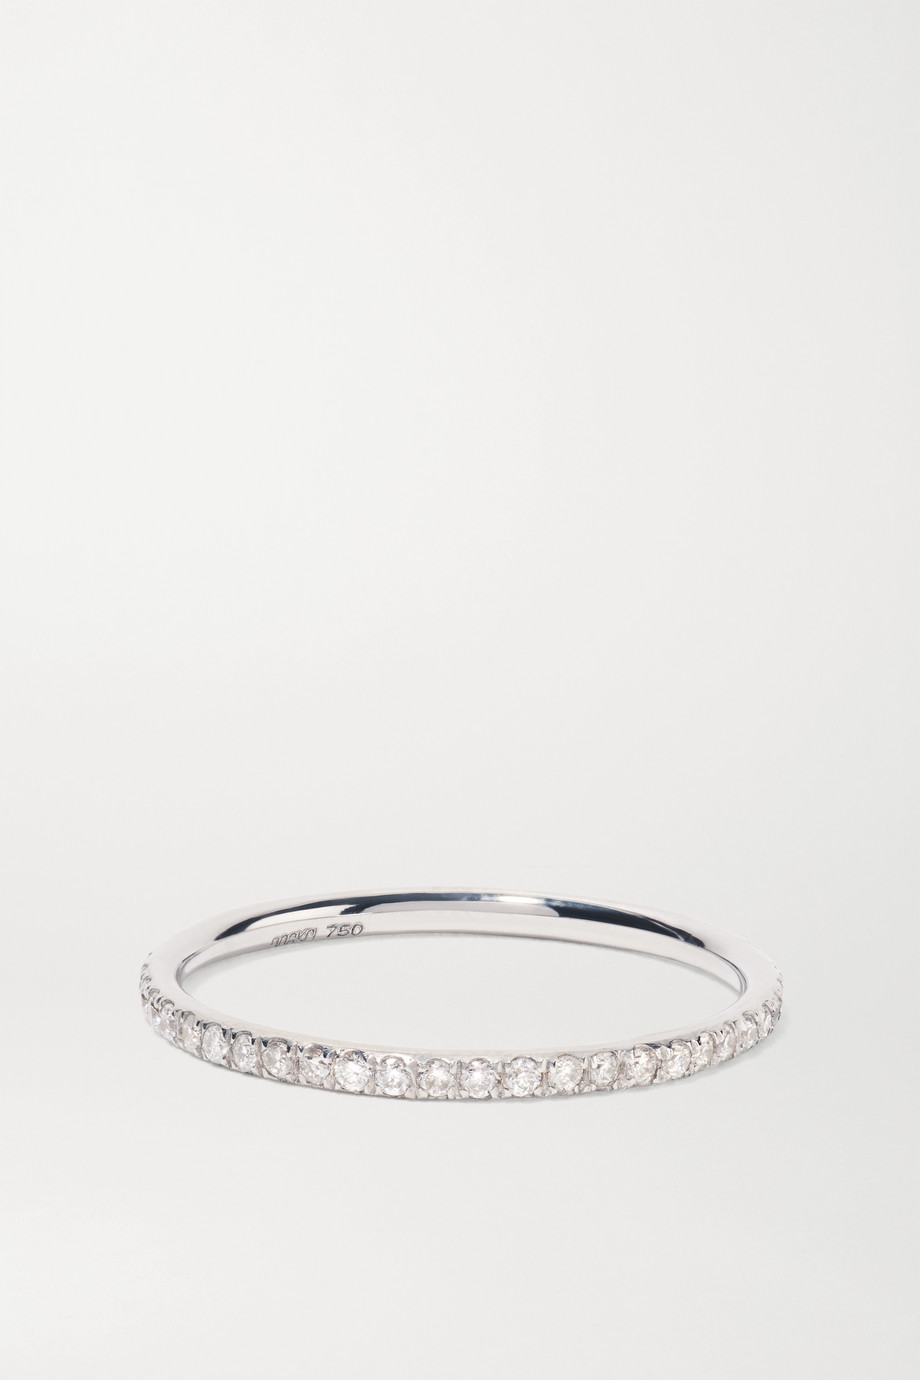 Ileana Makri Thread 18-karat white gold diamond ring